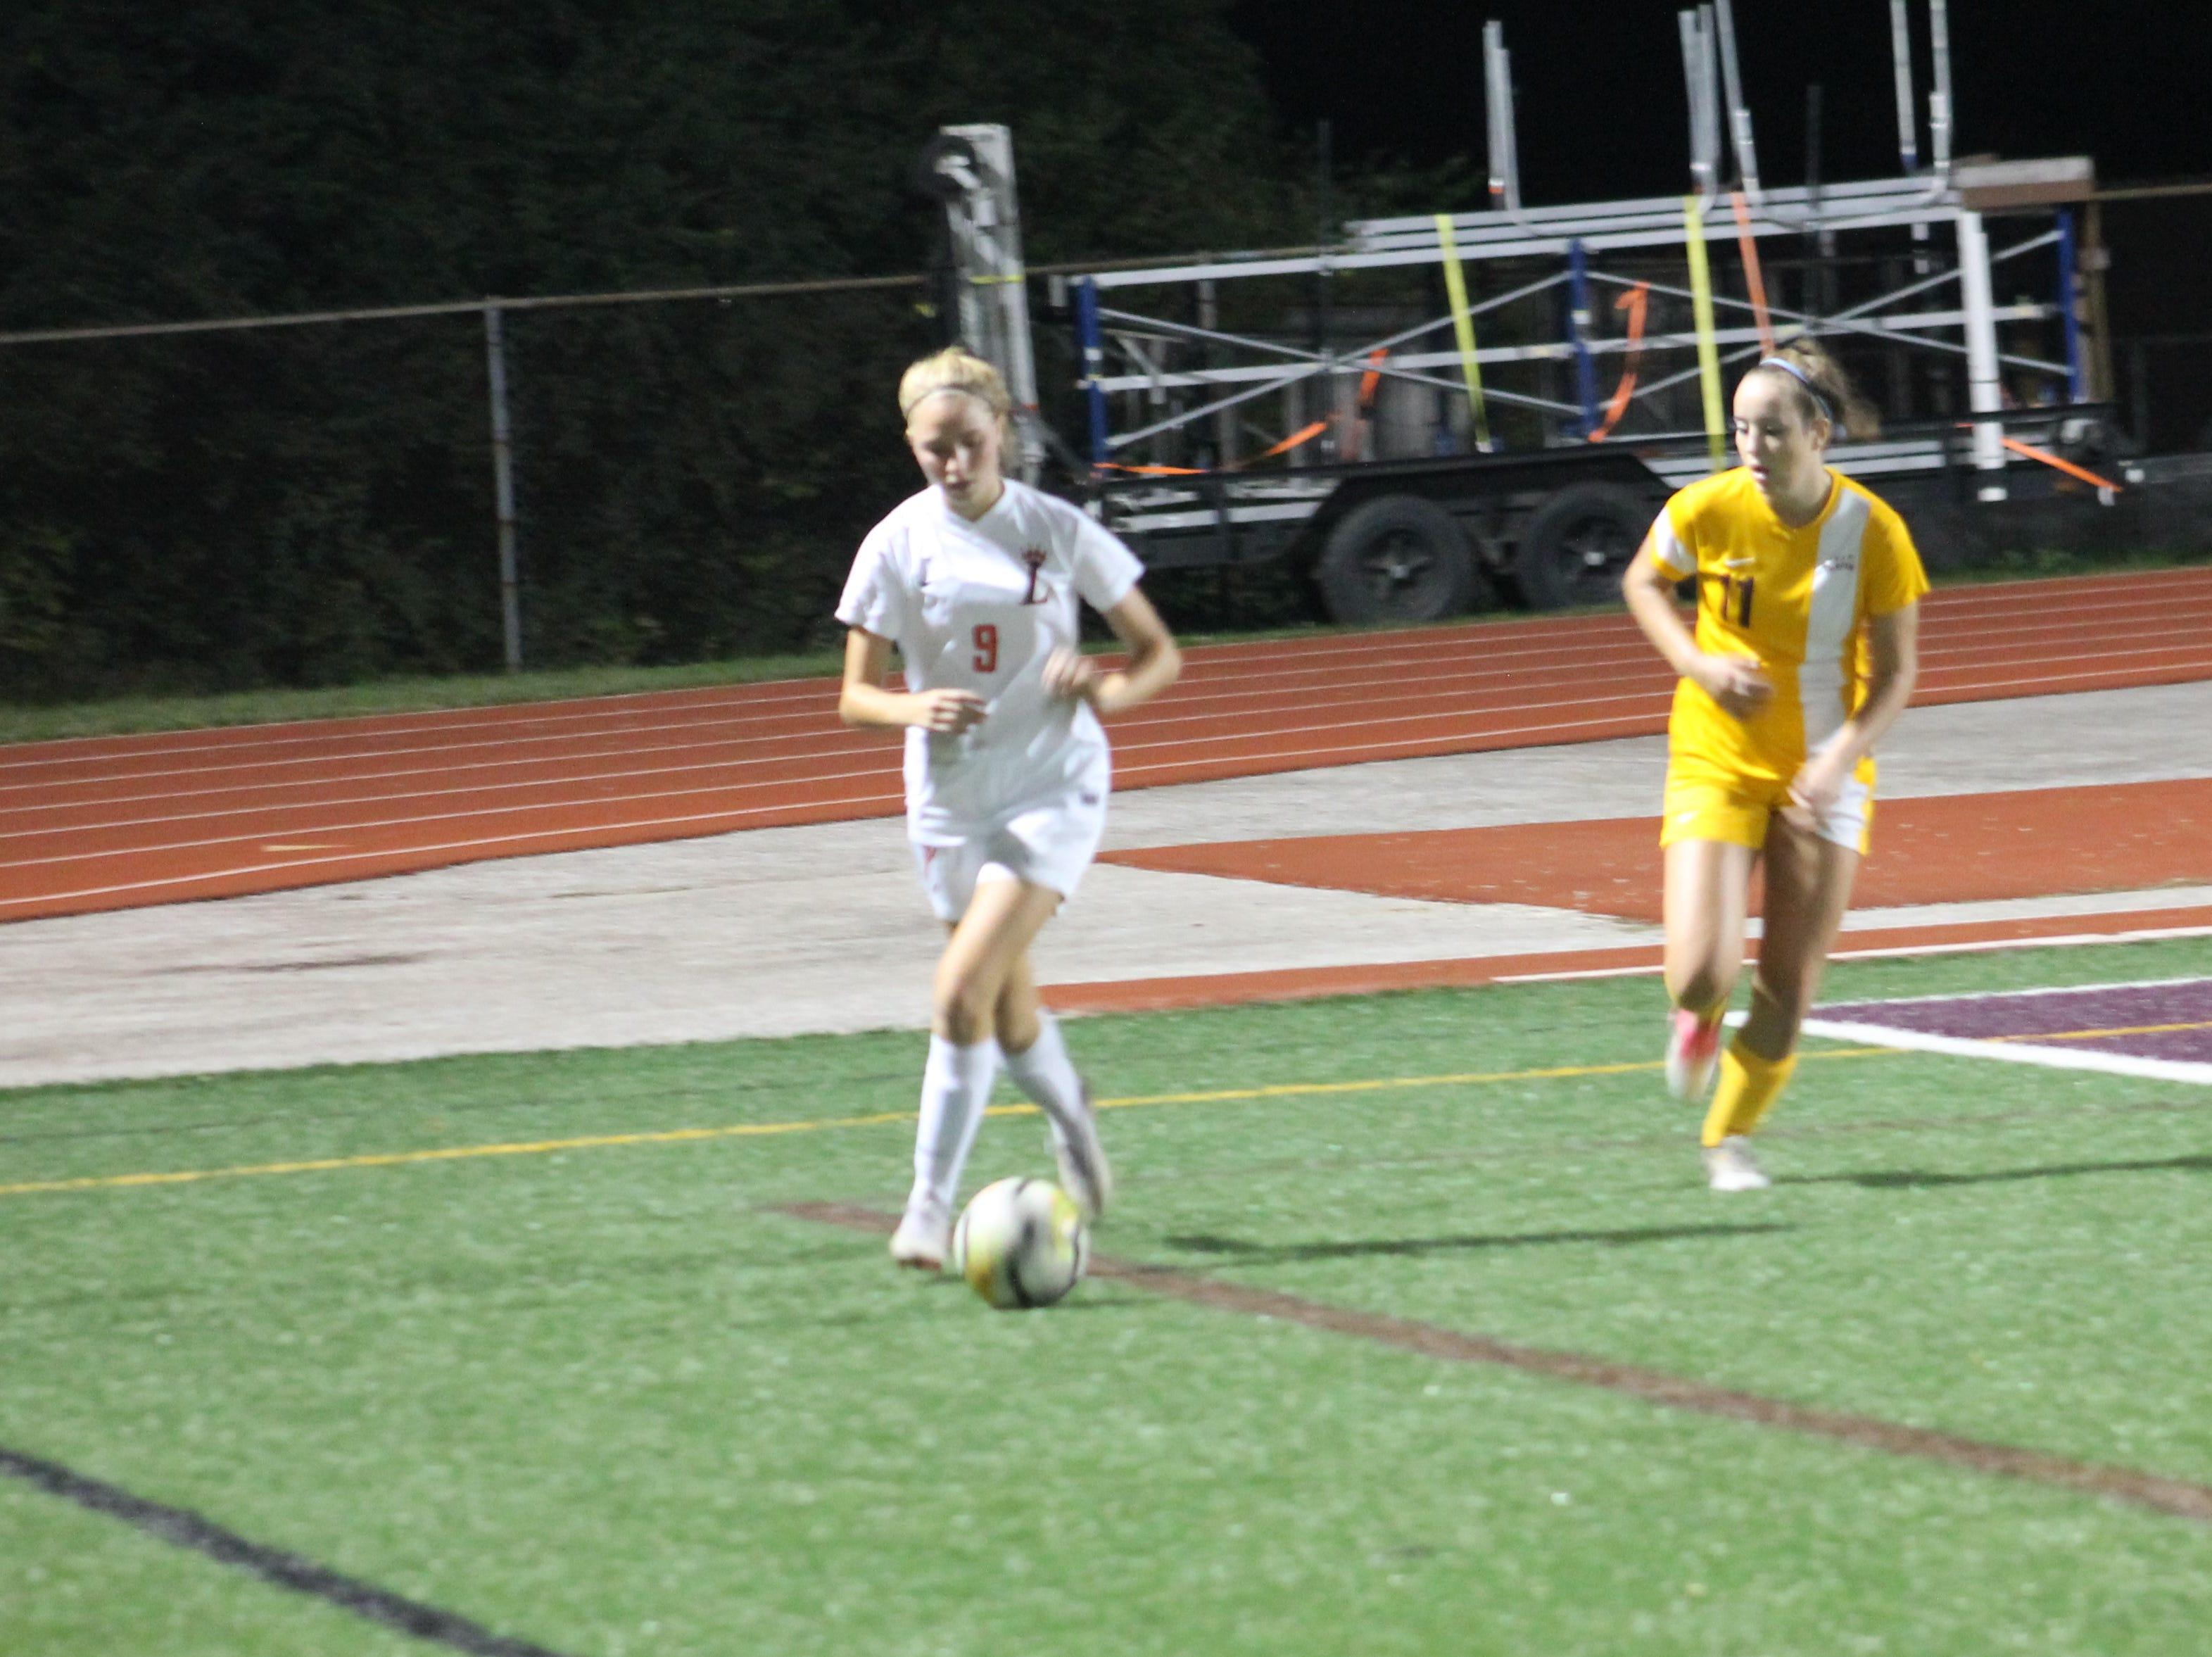 Loveland sophomore Catrin Palmer dribbles upfield with Turpin's Mimi Pinckney in pursuit